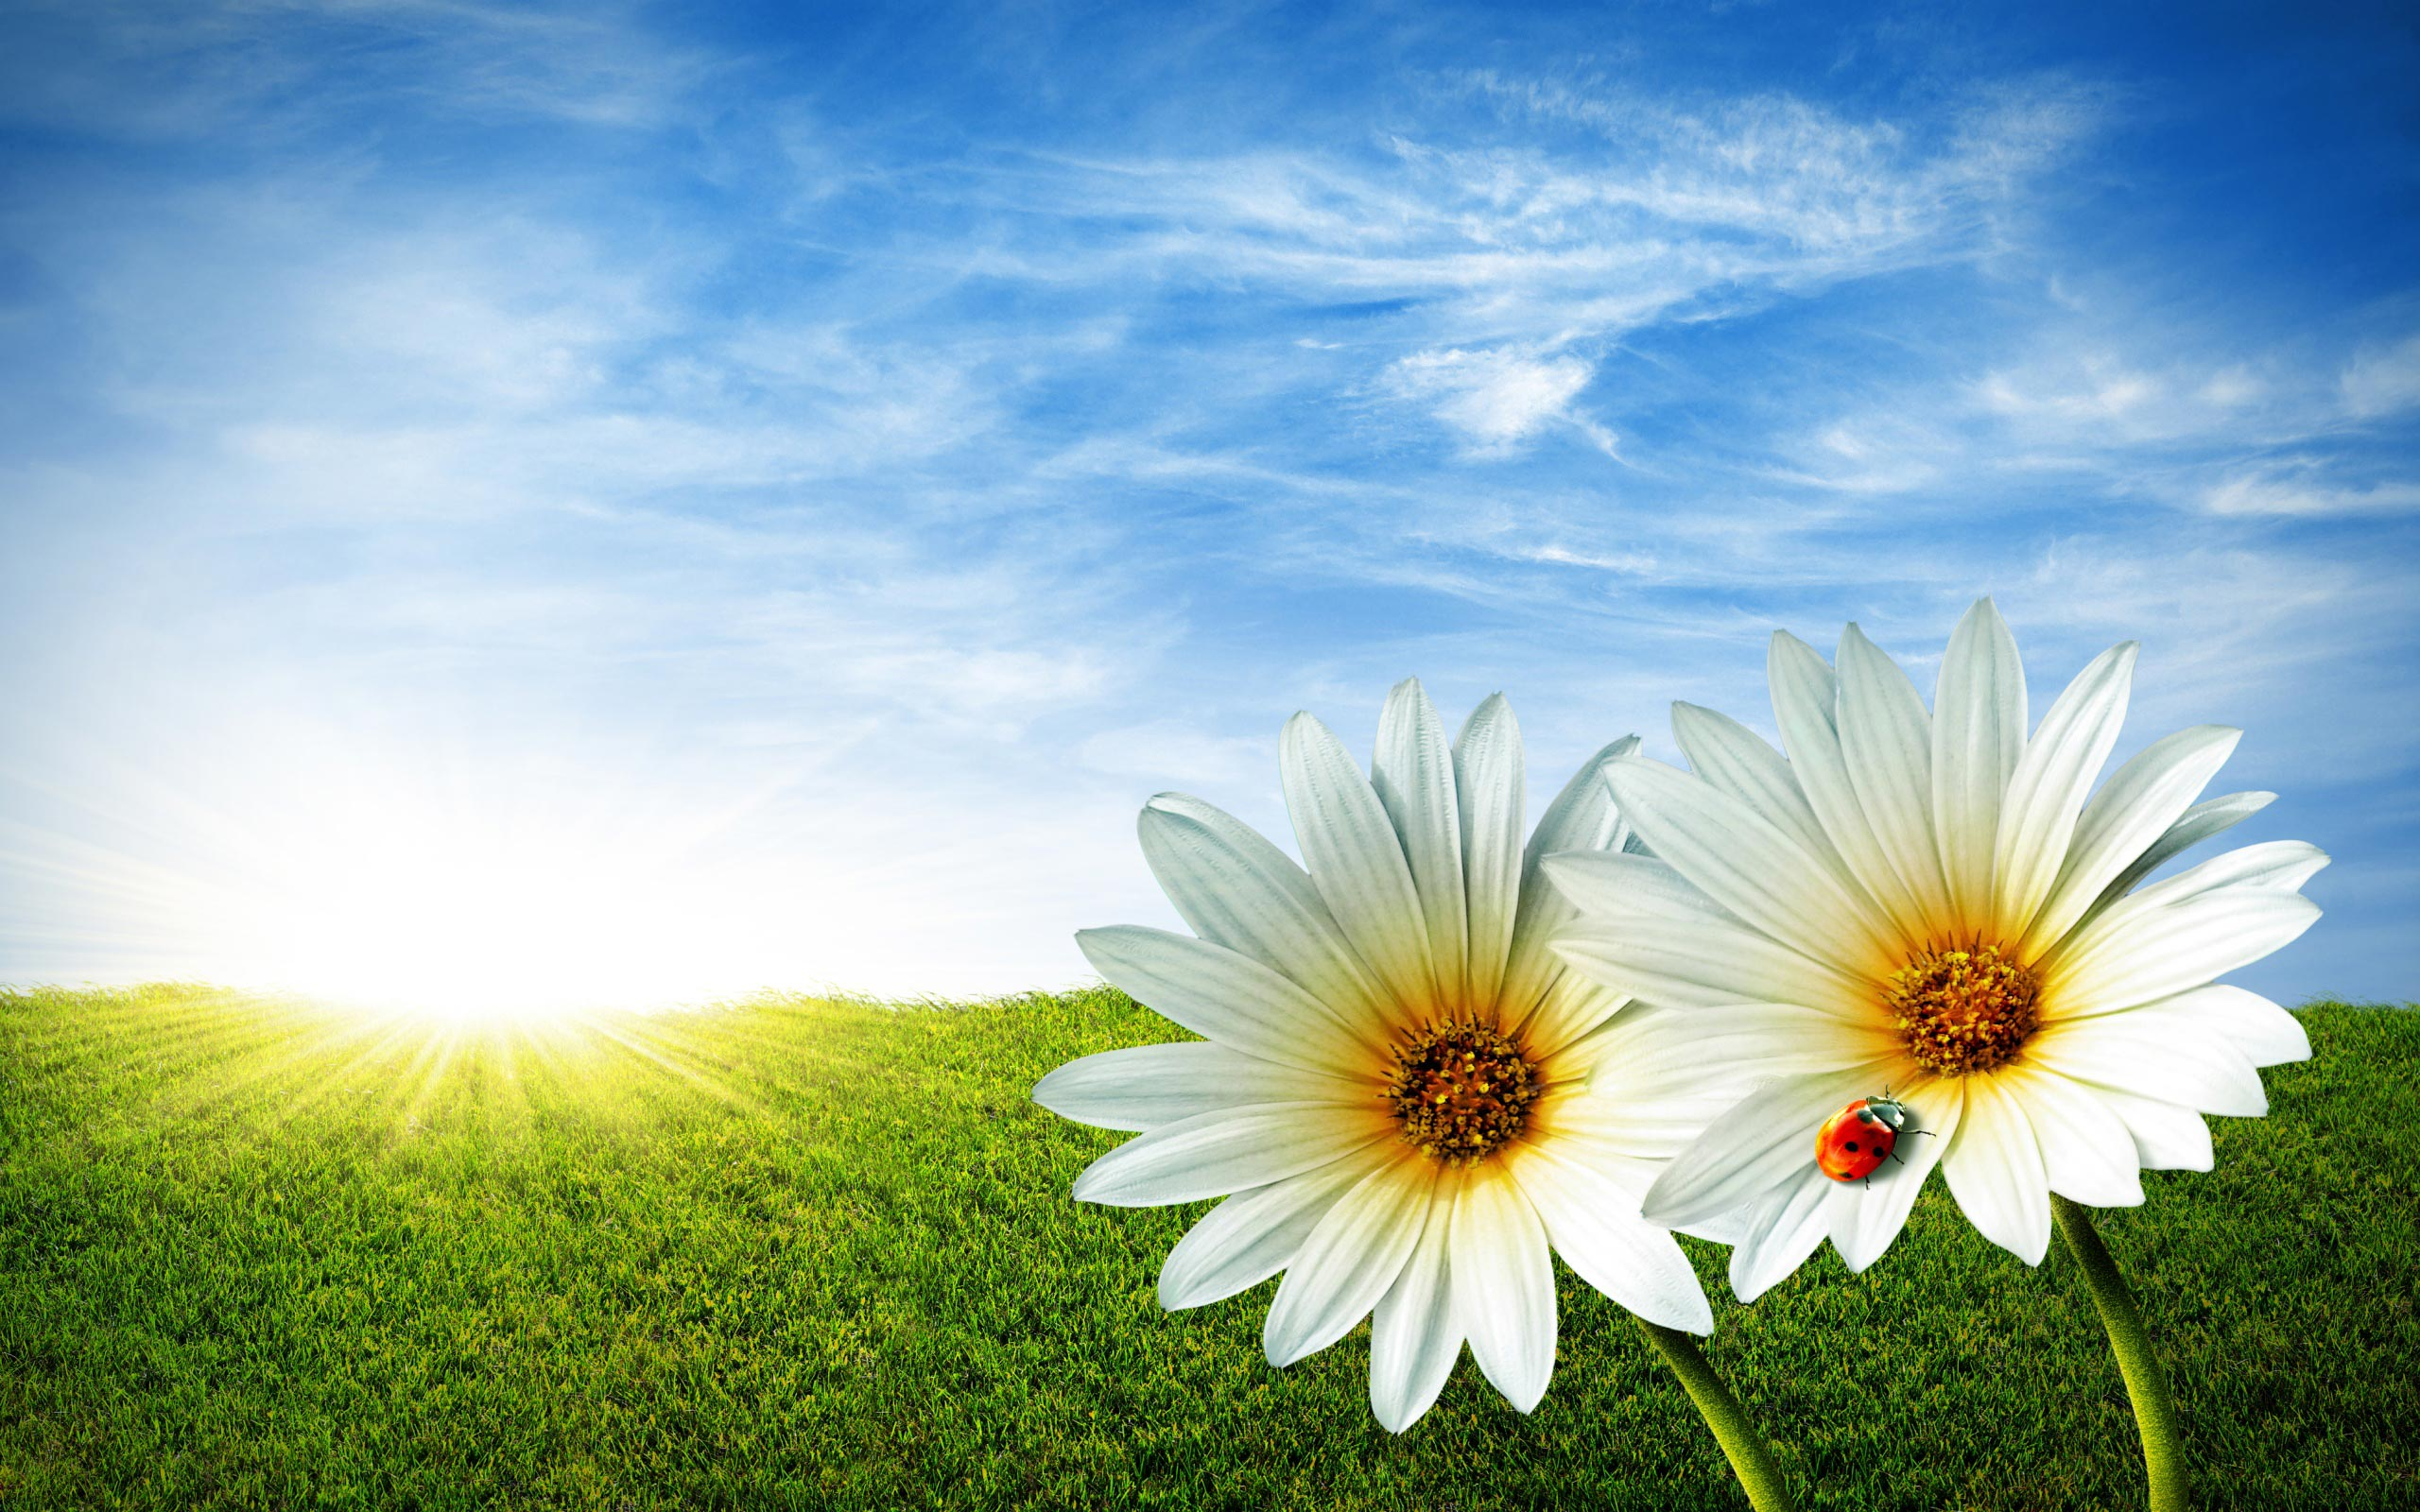 Spring HD Wallpaper 2560x1600 2560x1600